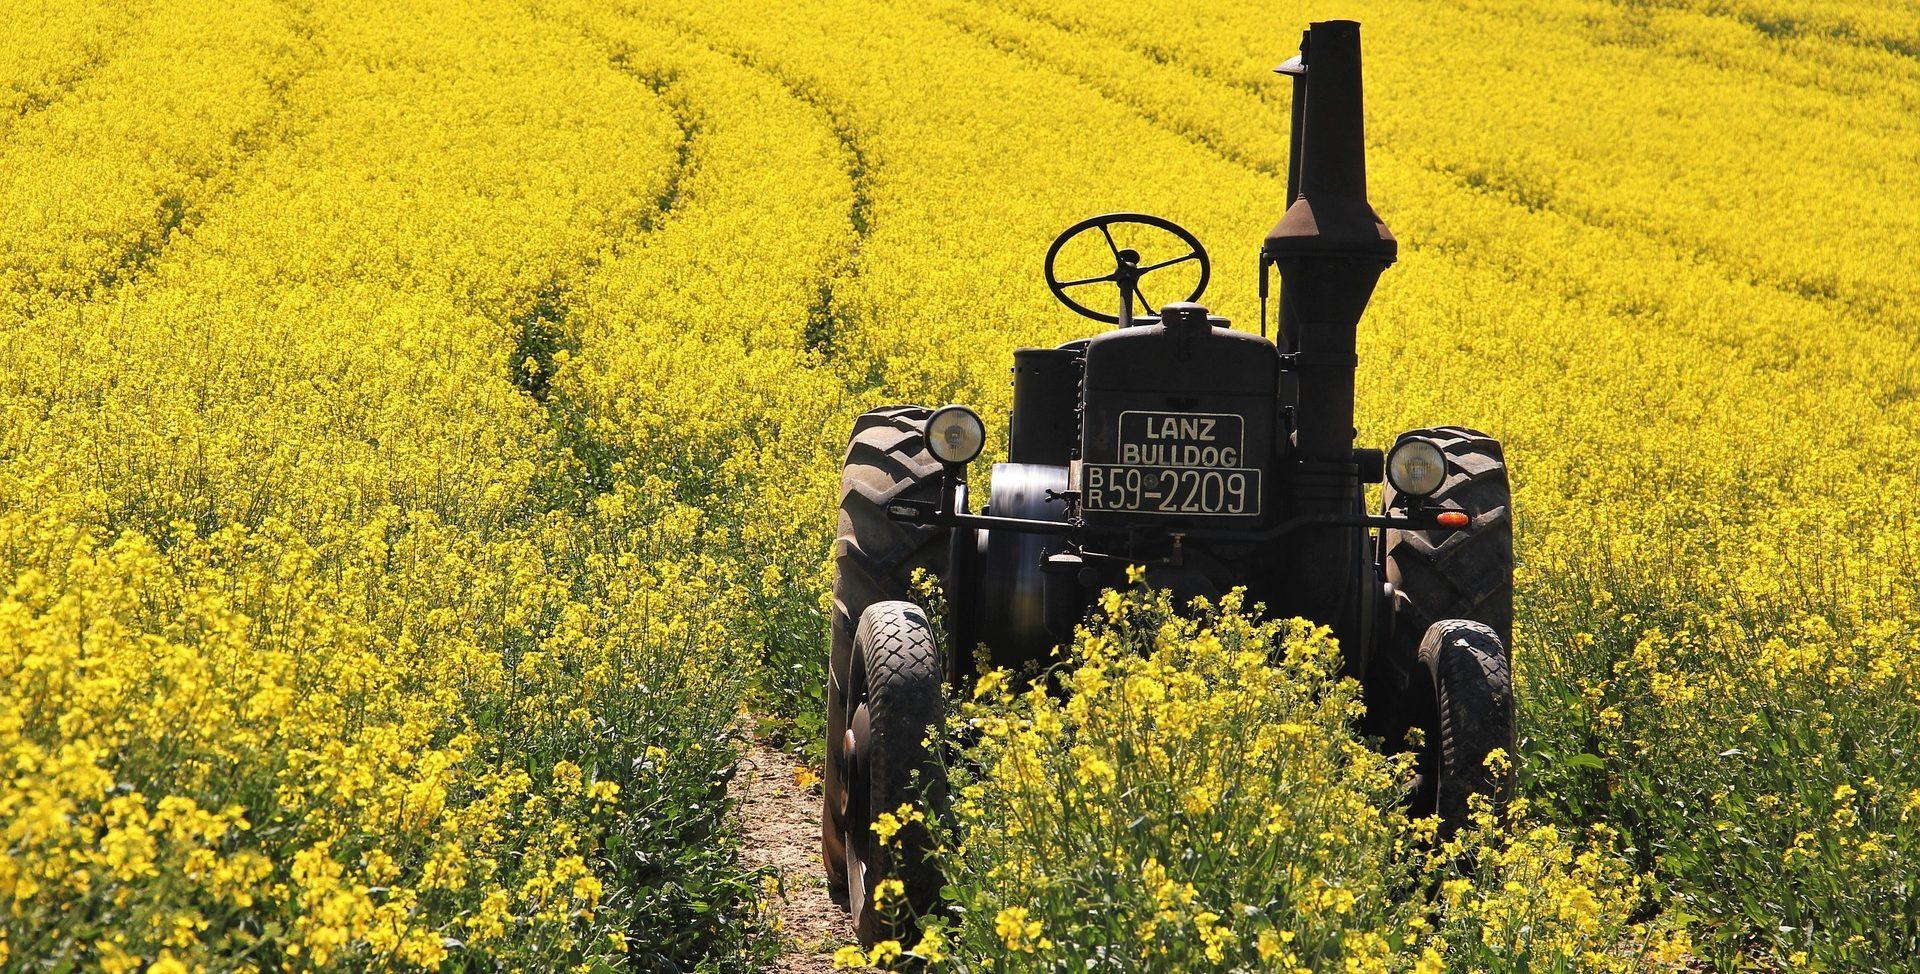 campo naturaleza commodities recurso